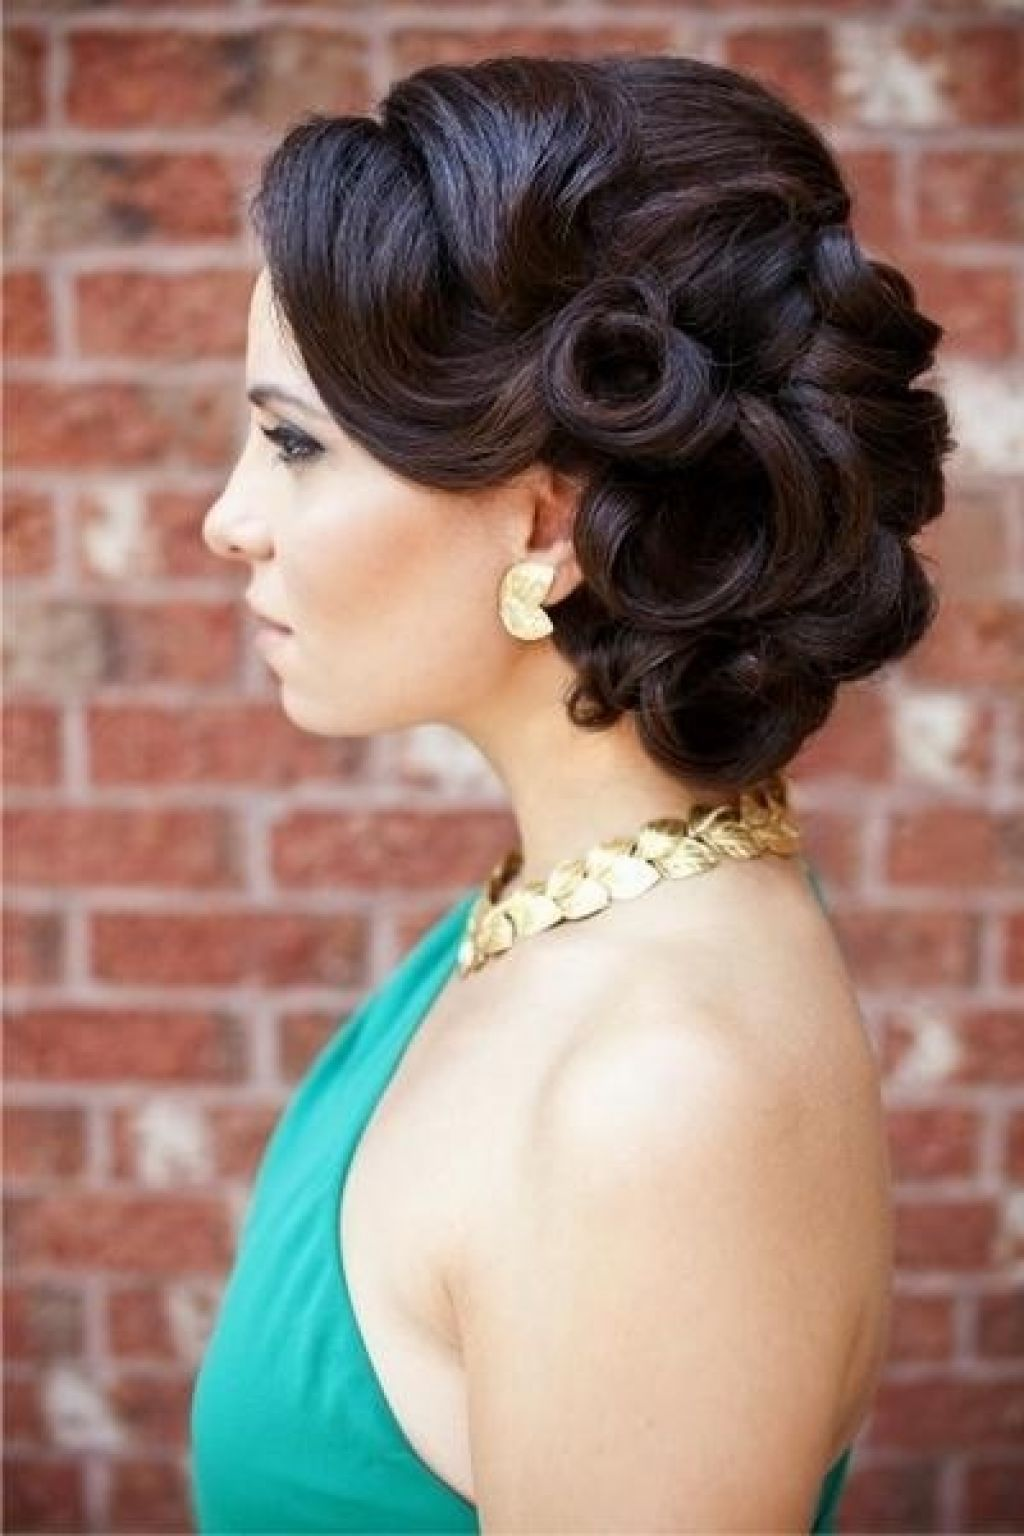 Wedding Hairstyle Ideas Hair Up Styles Short Hair Styles Vintage Hairstyles